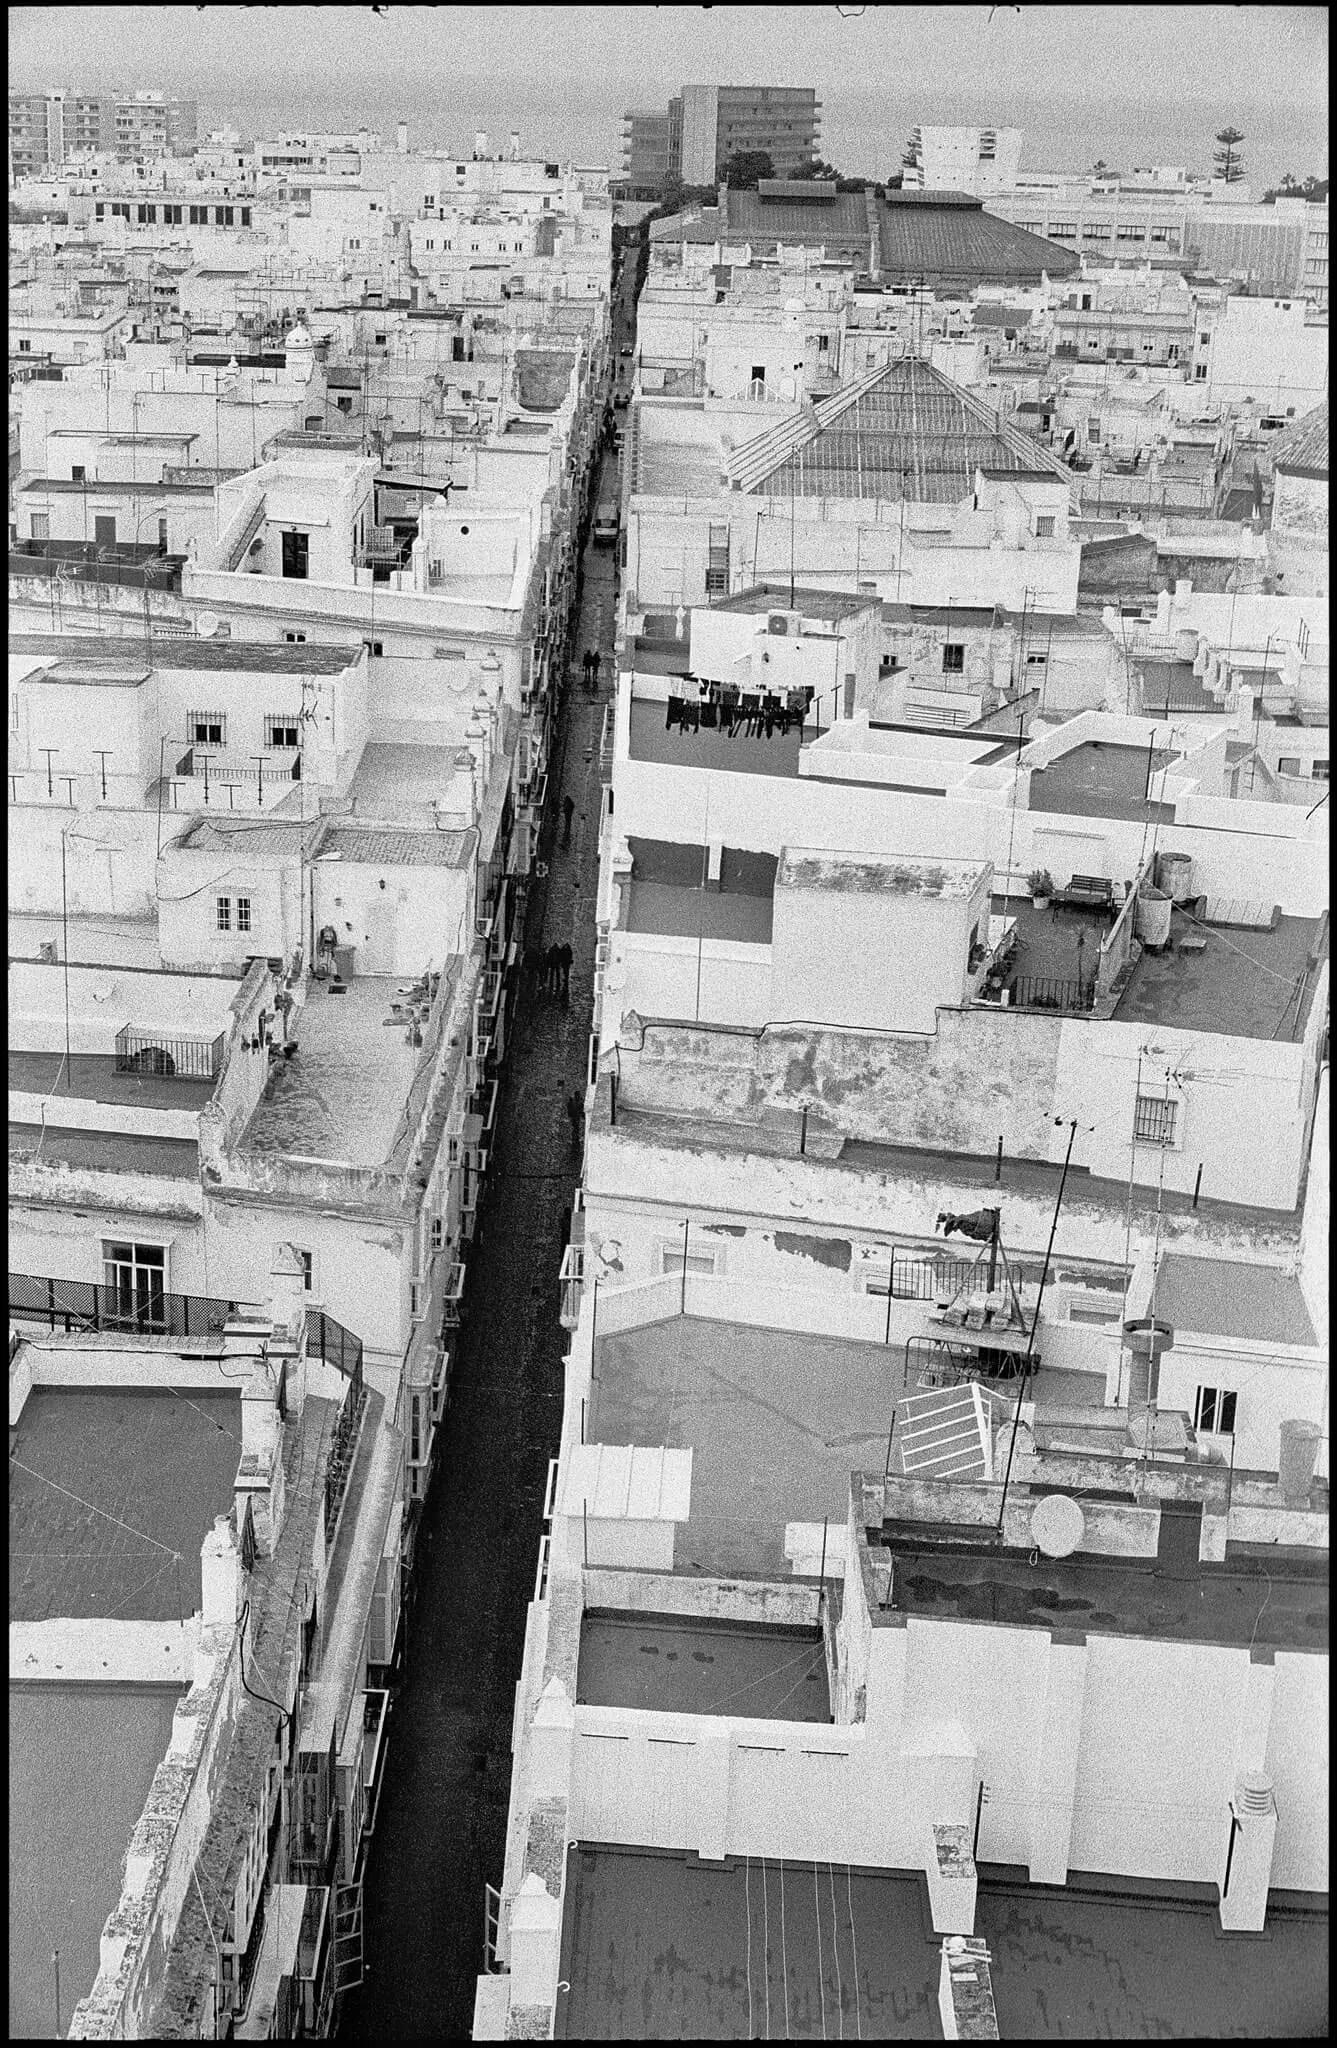 Cadiz, Spain - Leica R6 + Leica 60mm Macro-Elmarit f-2.8, Kodak 5222 Double-X 5222